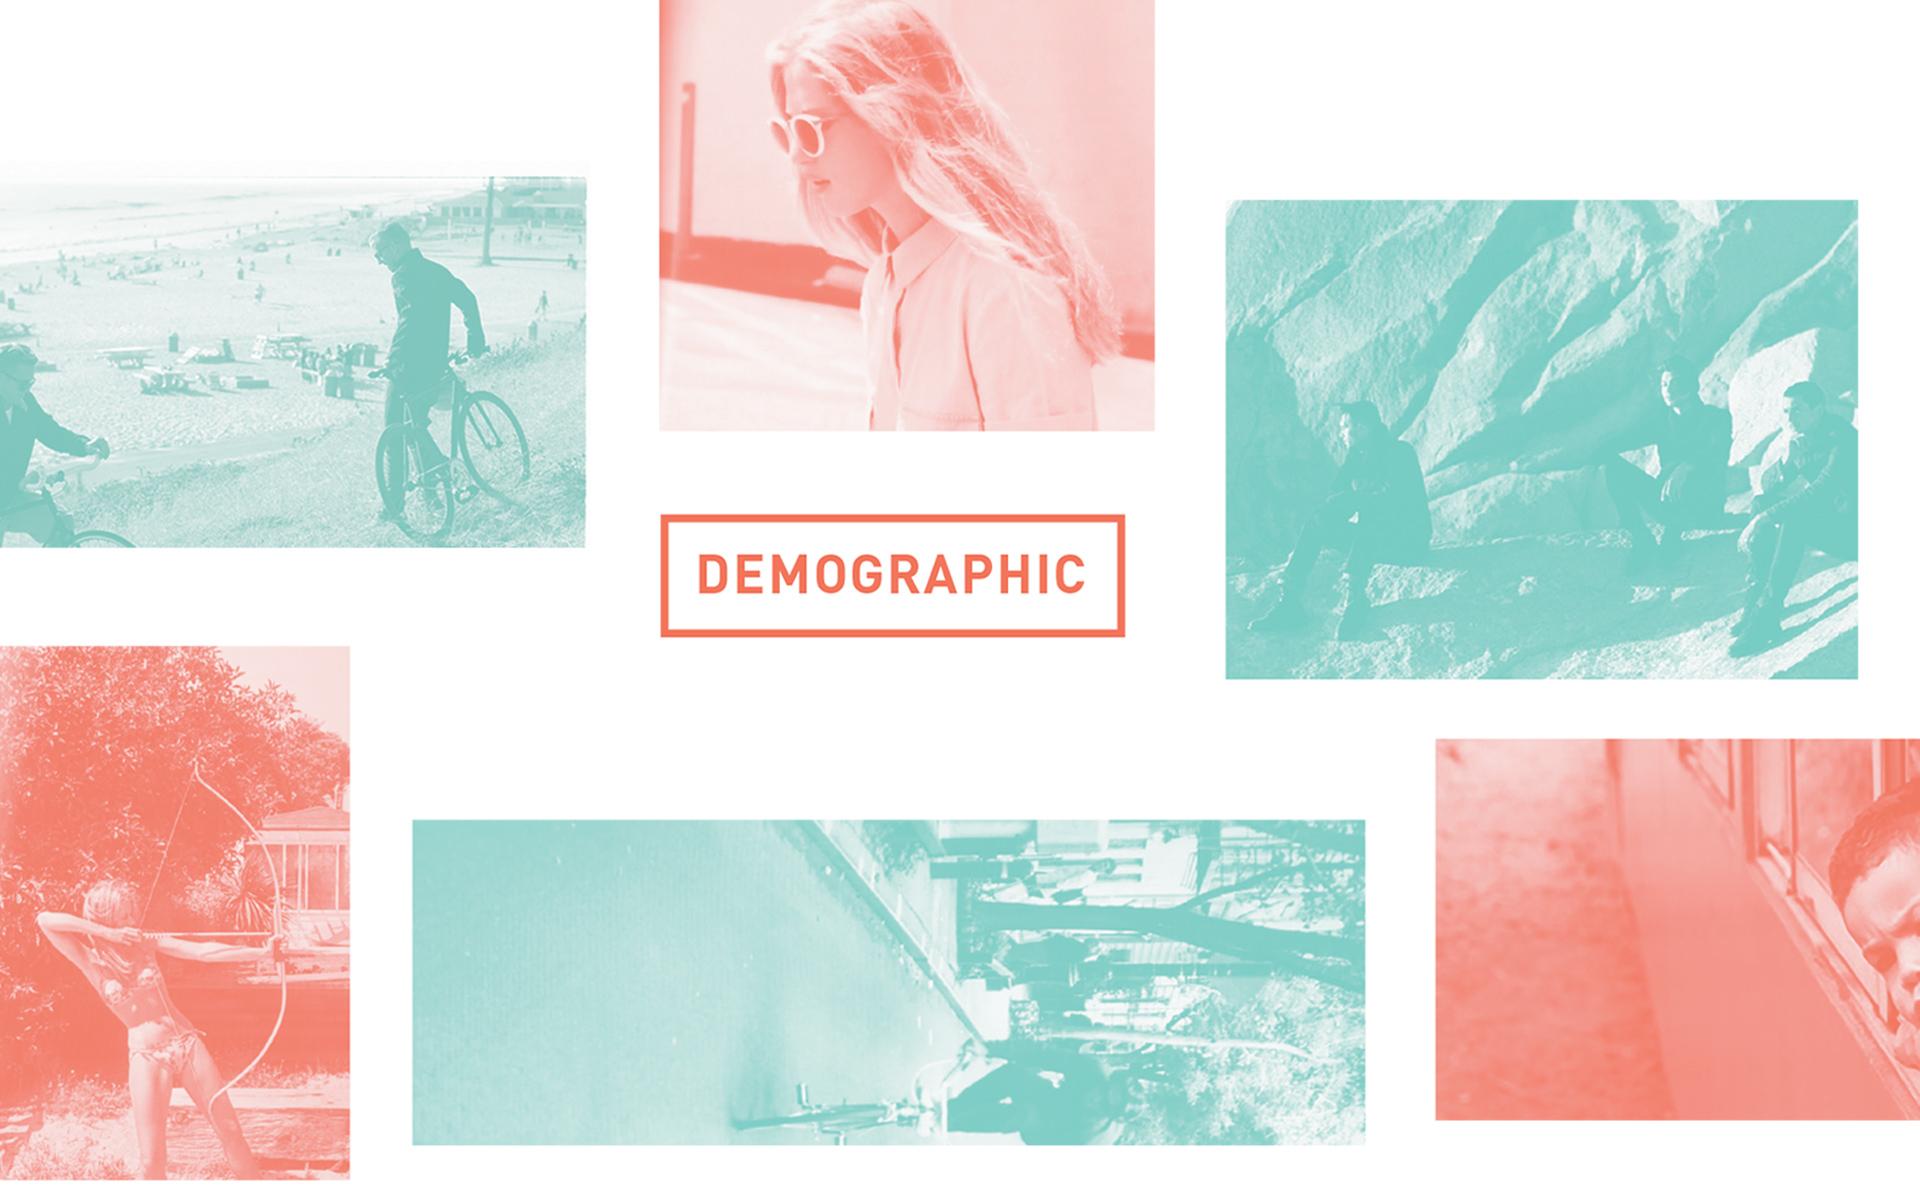 SSWeb-Bunkr-Demographic Overview